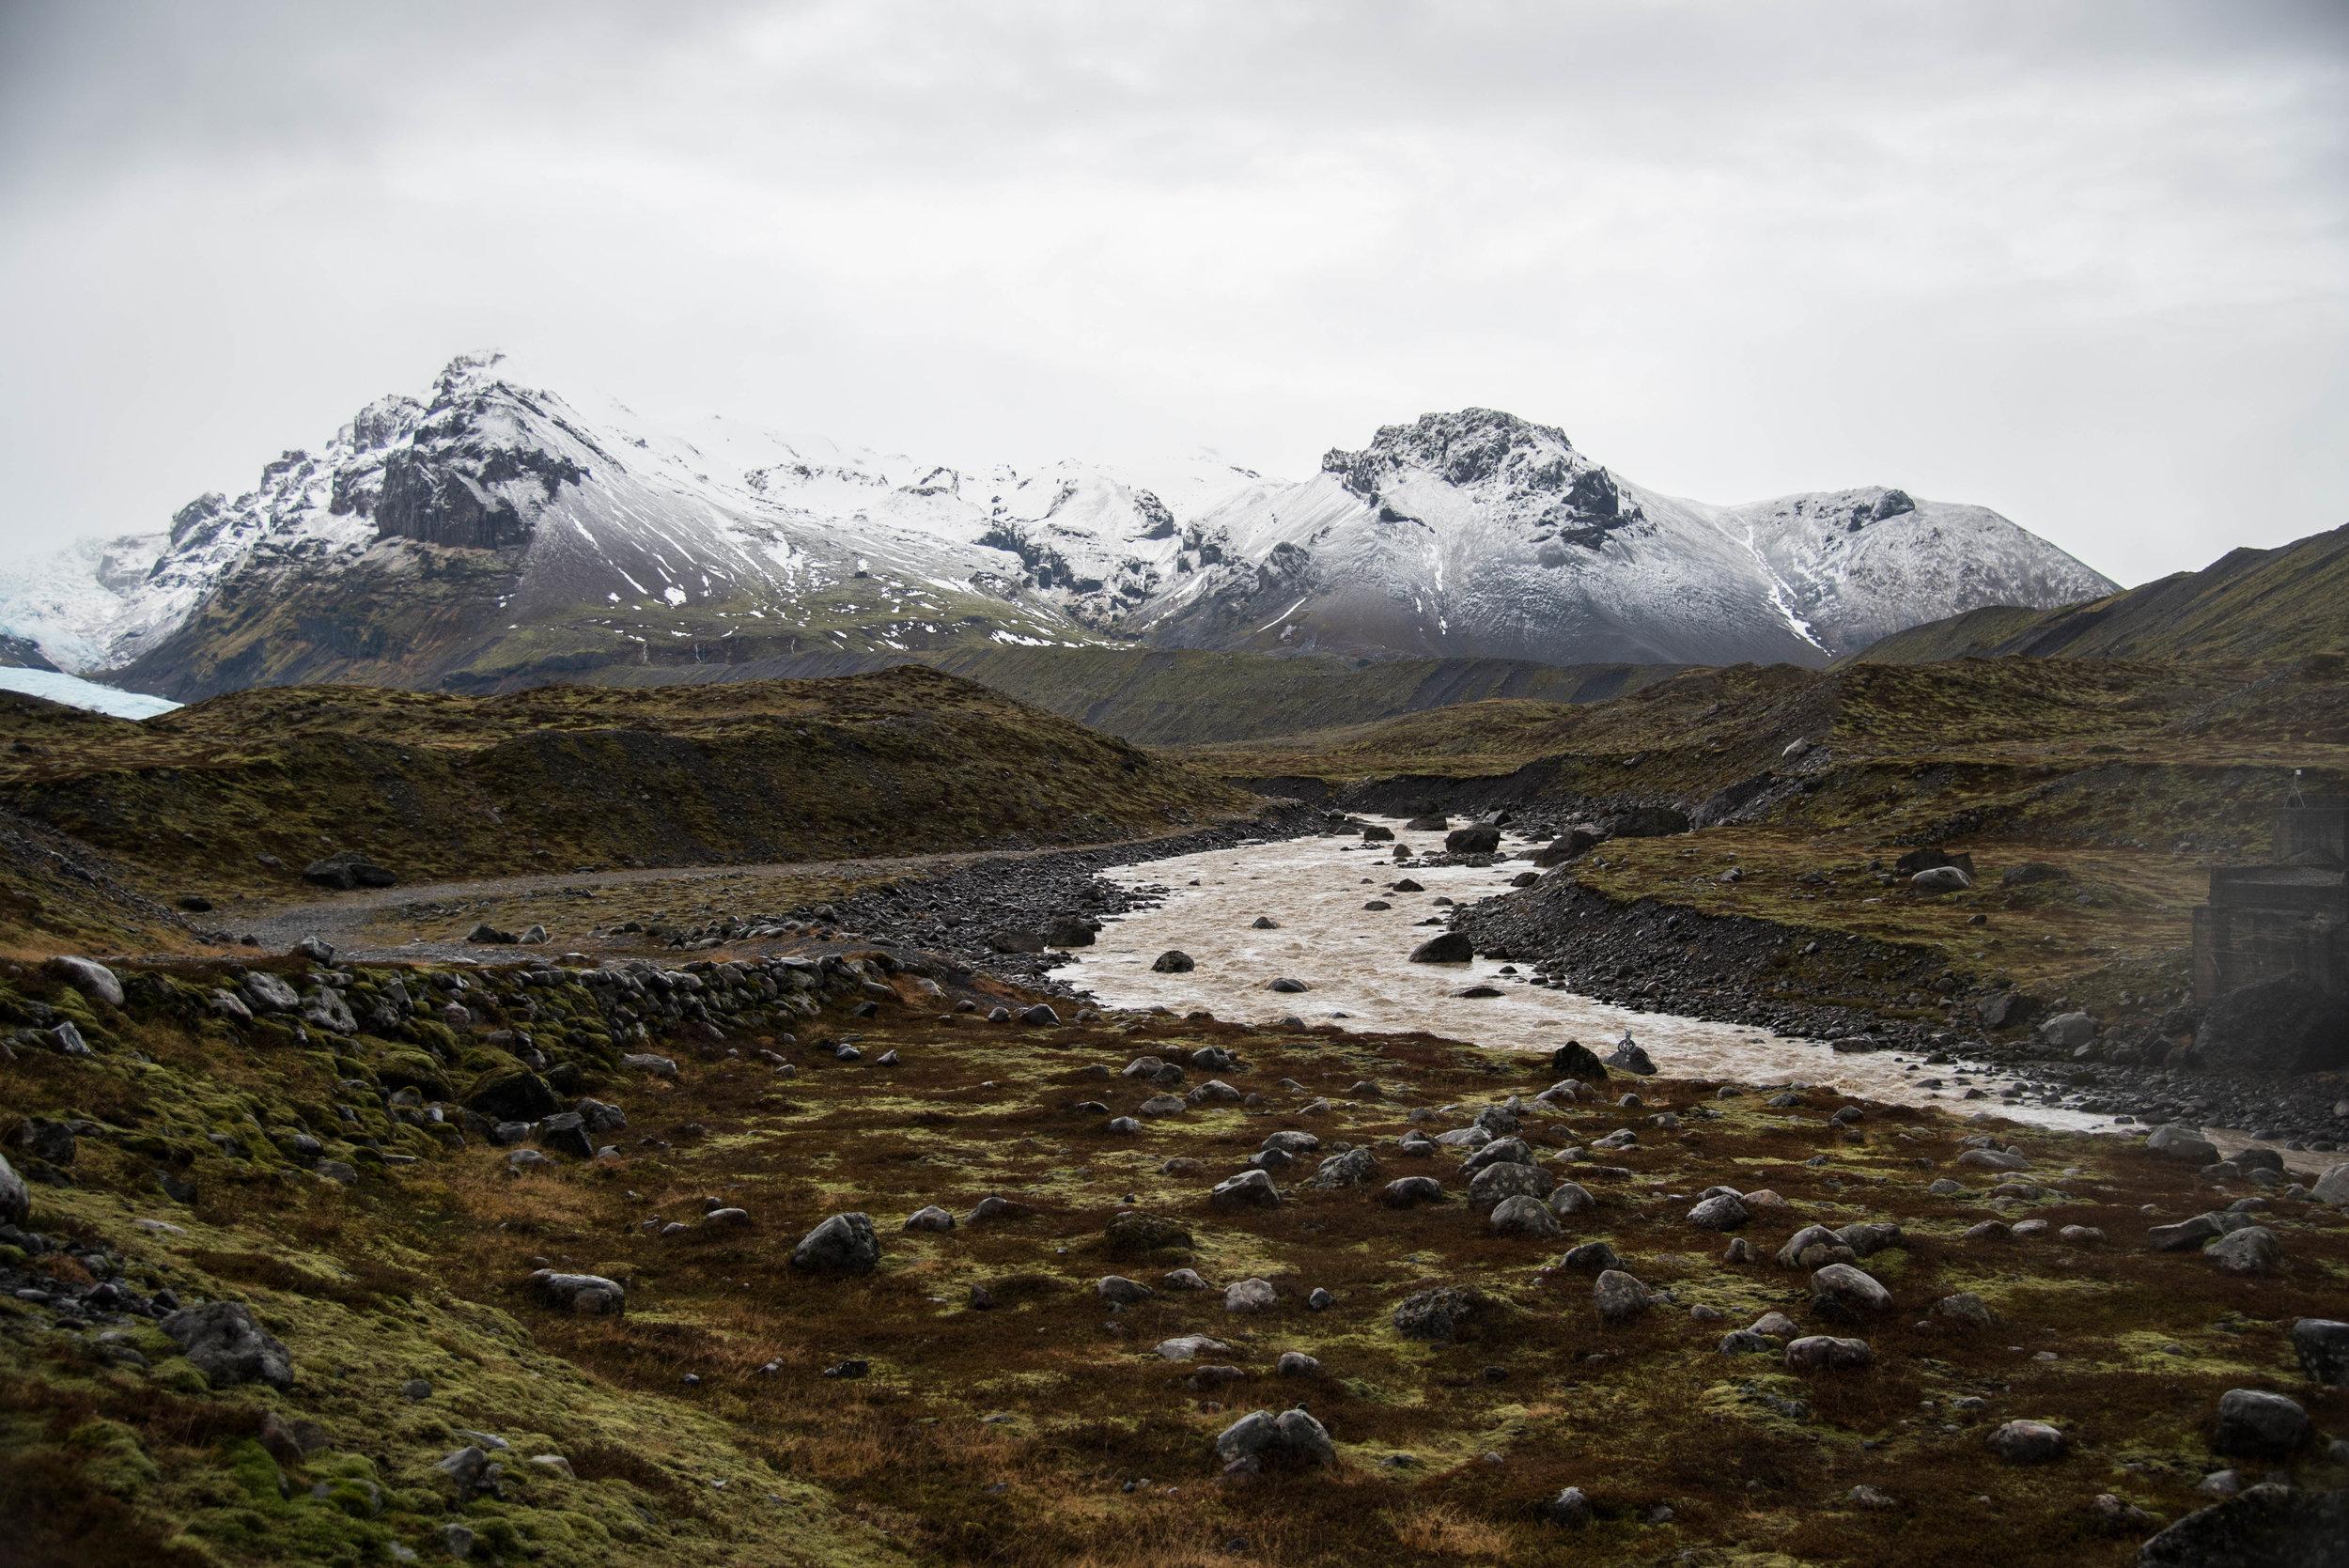 KvíamyrarkamburGlacier - Iceland's Secret Lagoon